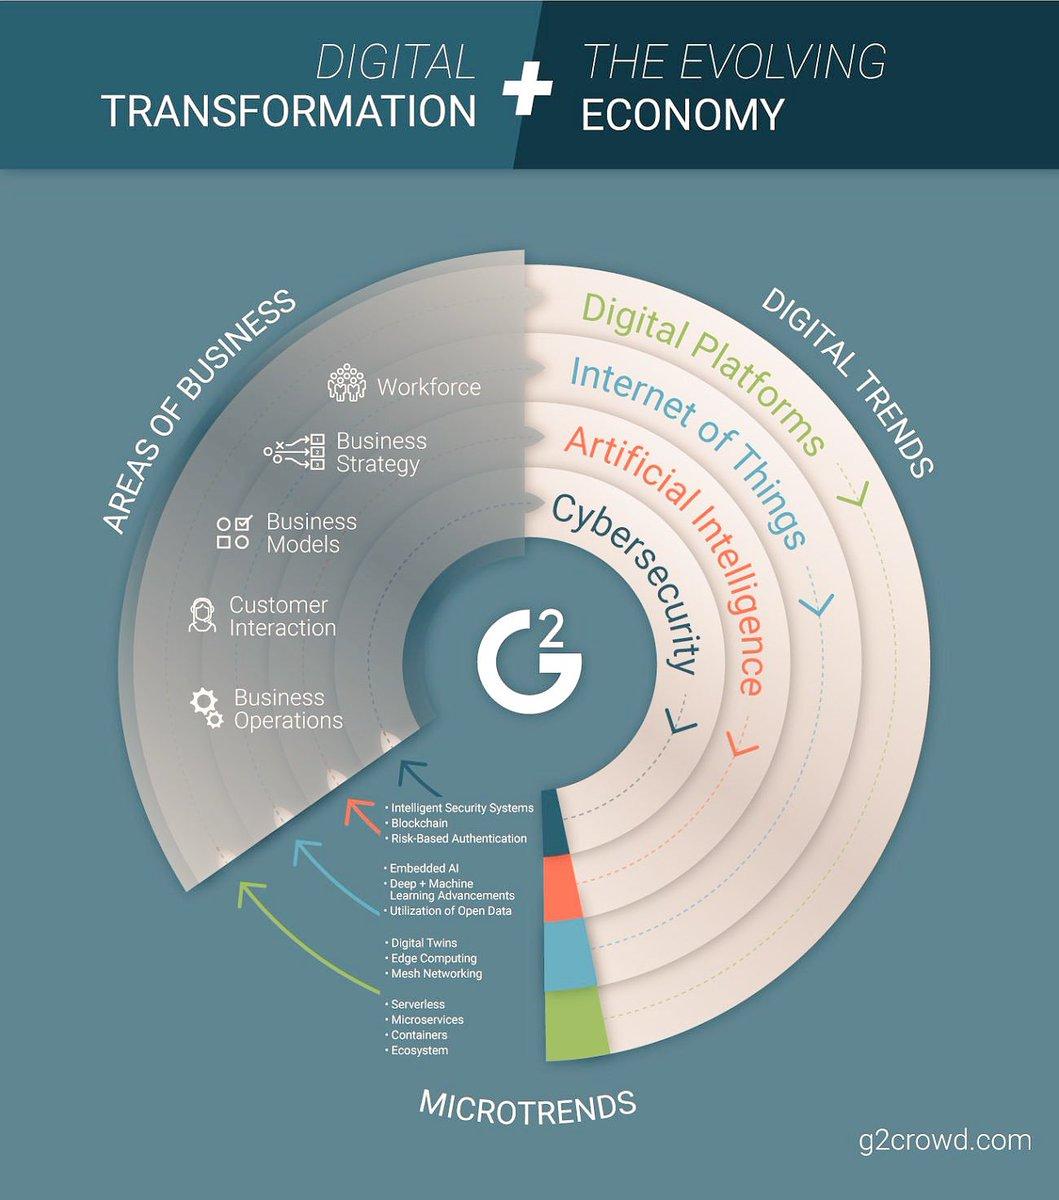 Trends in Digital Transformation   http:// bit.ly/2nSwsqM  &nbsp;     #AI #IoT #digital #fintech #banking #MachineLearning #business #data #innovation v/ @JimMarous<br>http://pic.twitter.com/bjPQuvWYkM